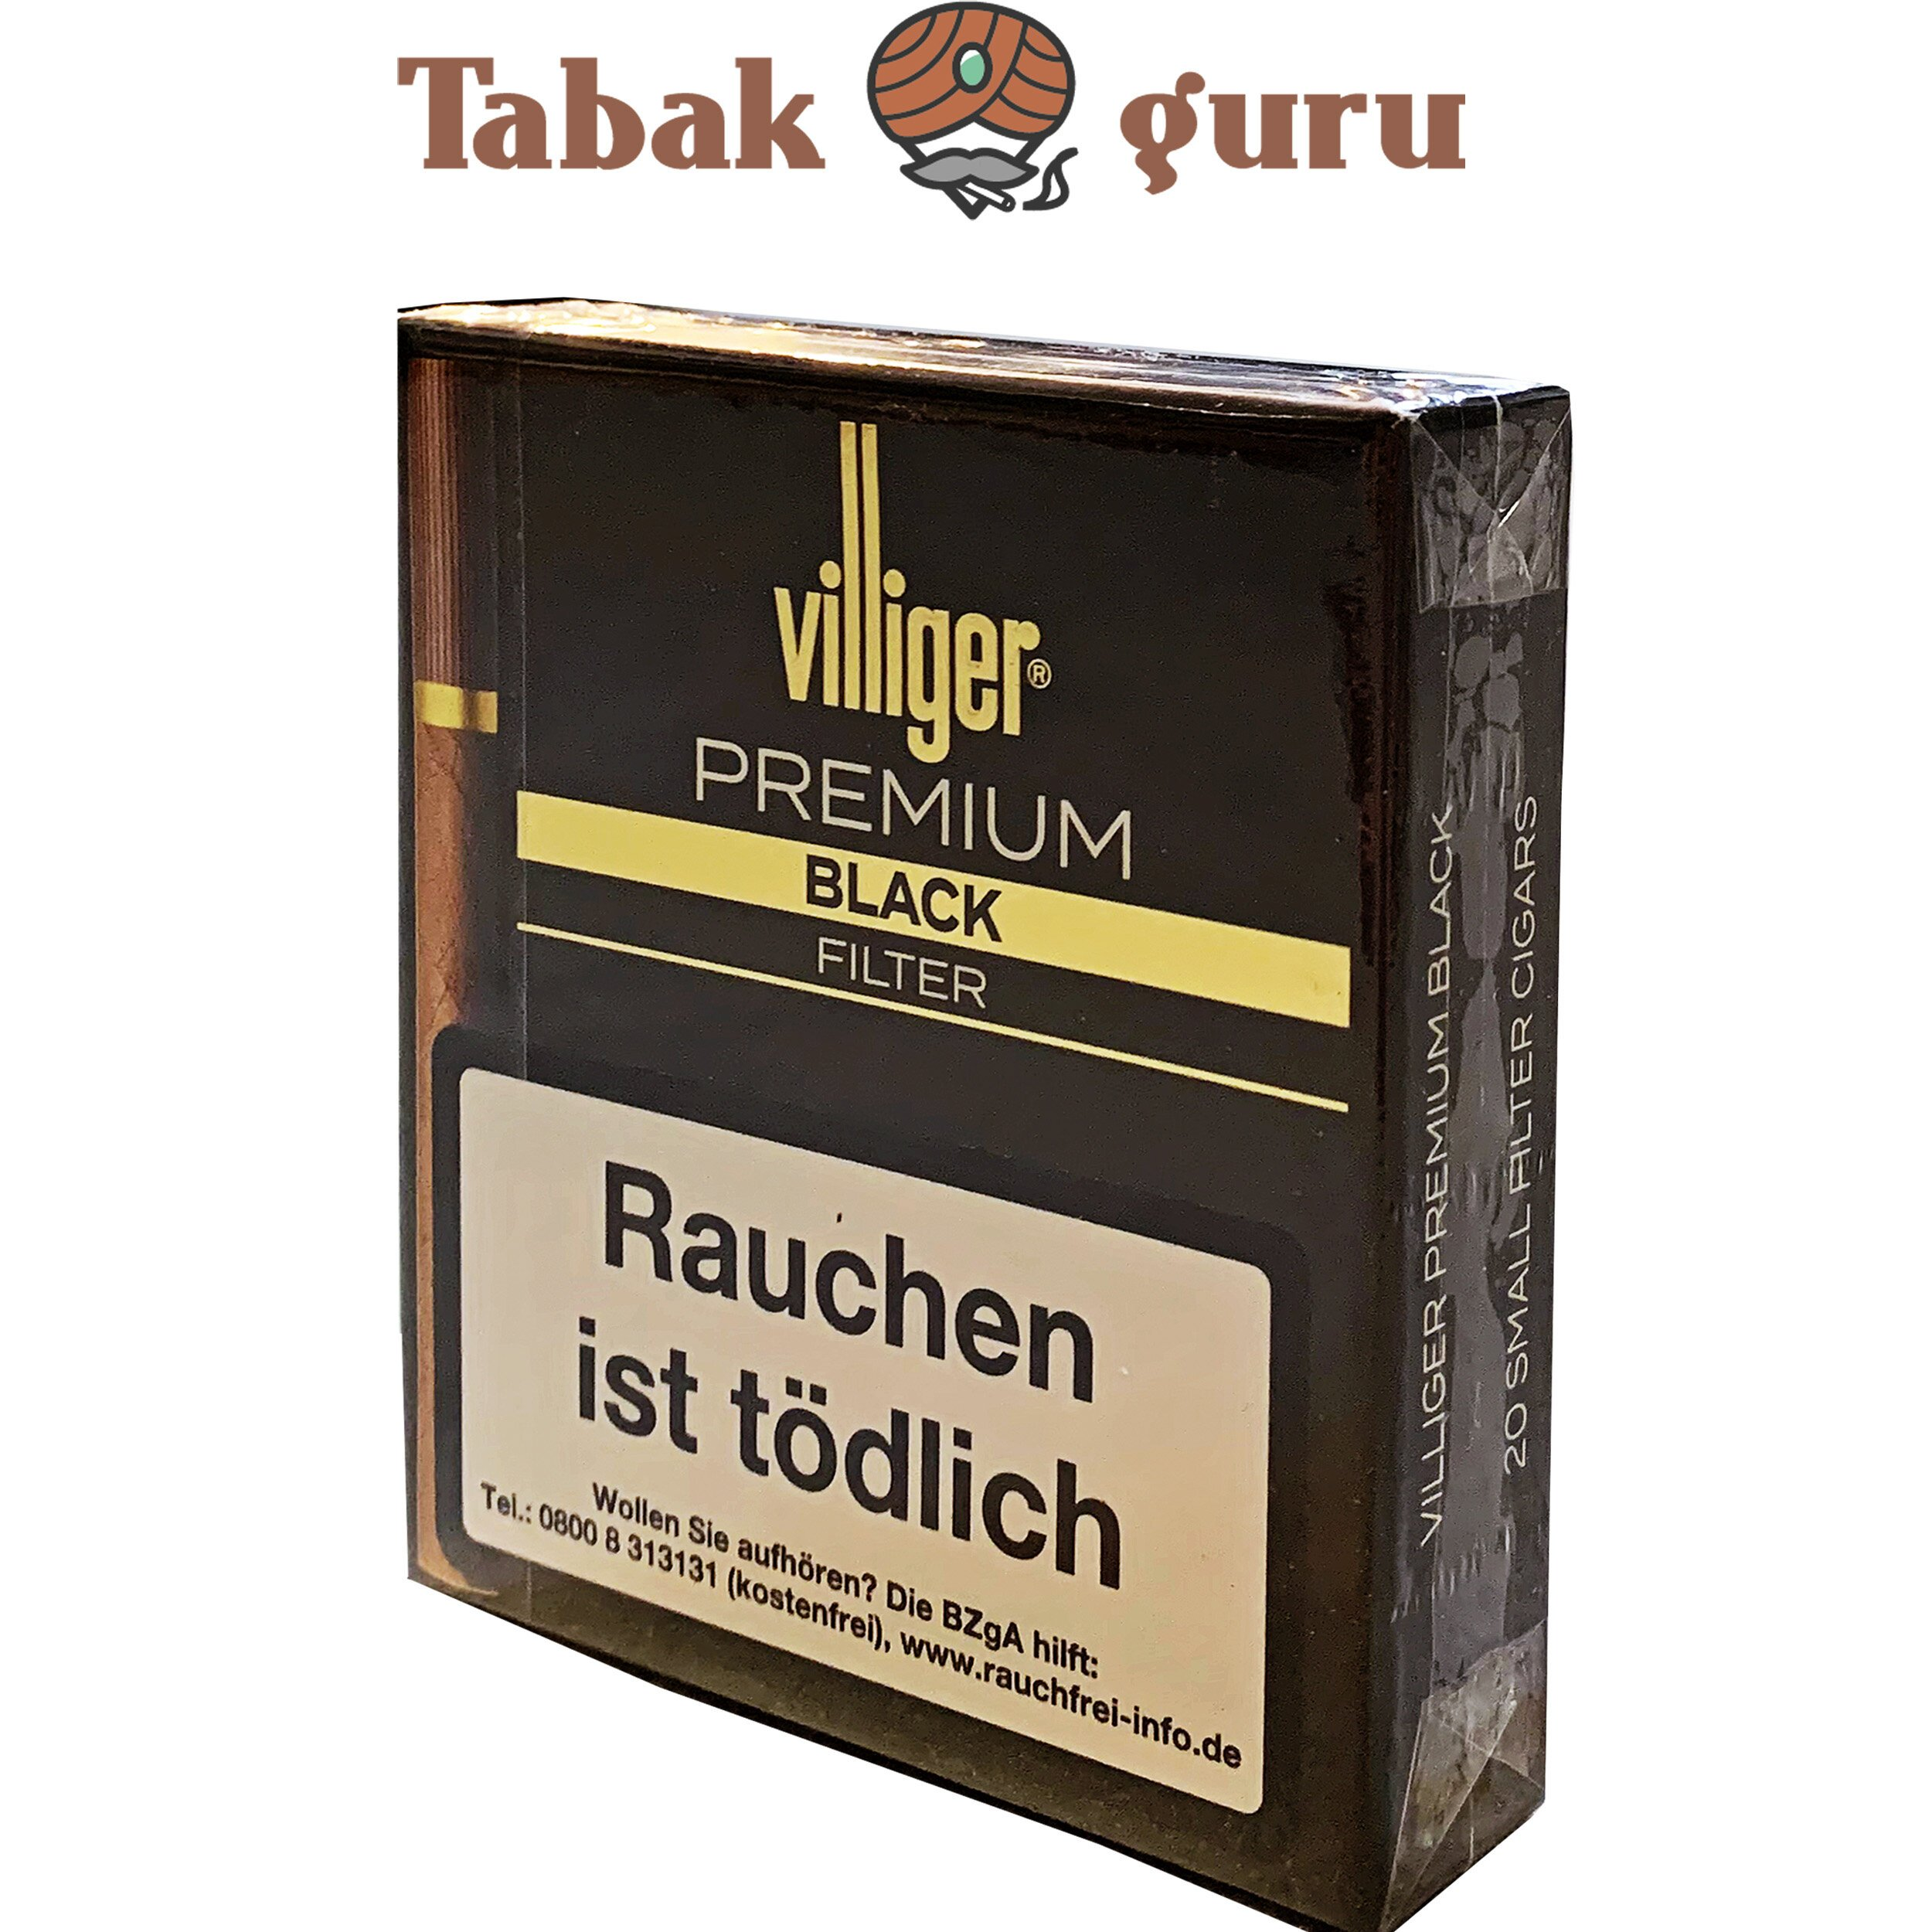 Villiger Premium Black Filter Filterzigarillos à 20 Stück